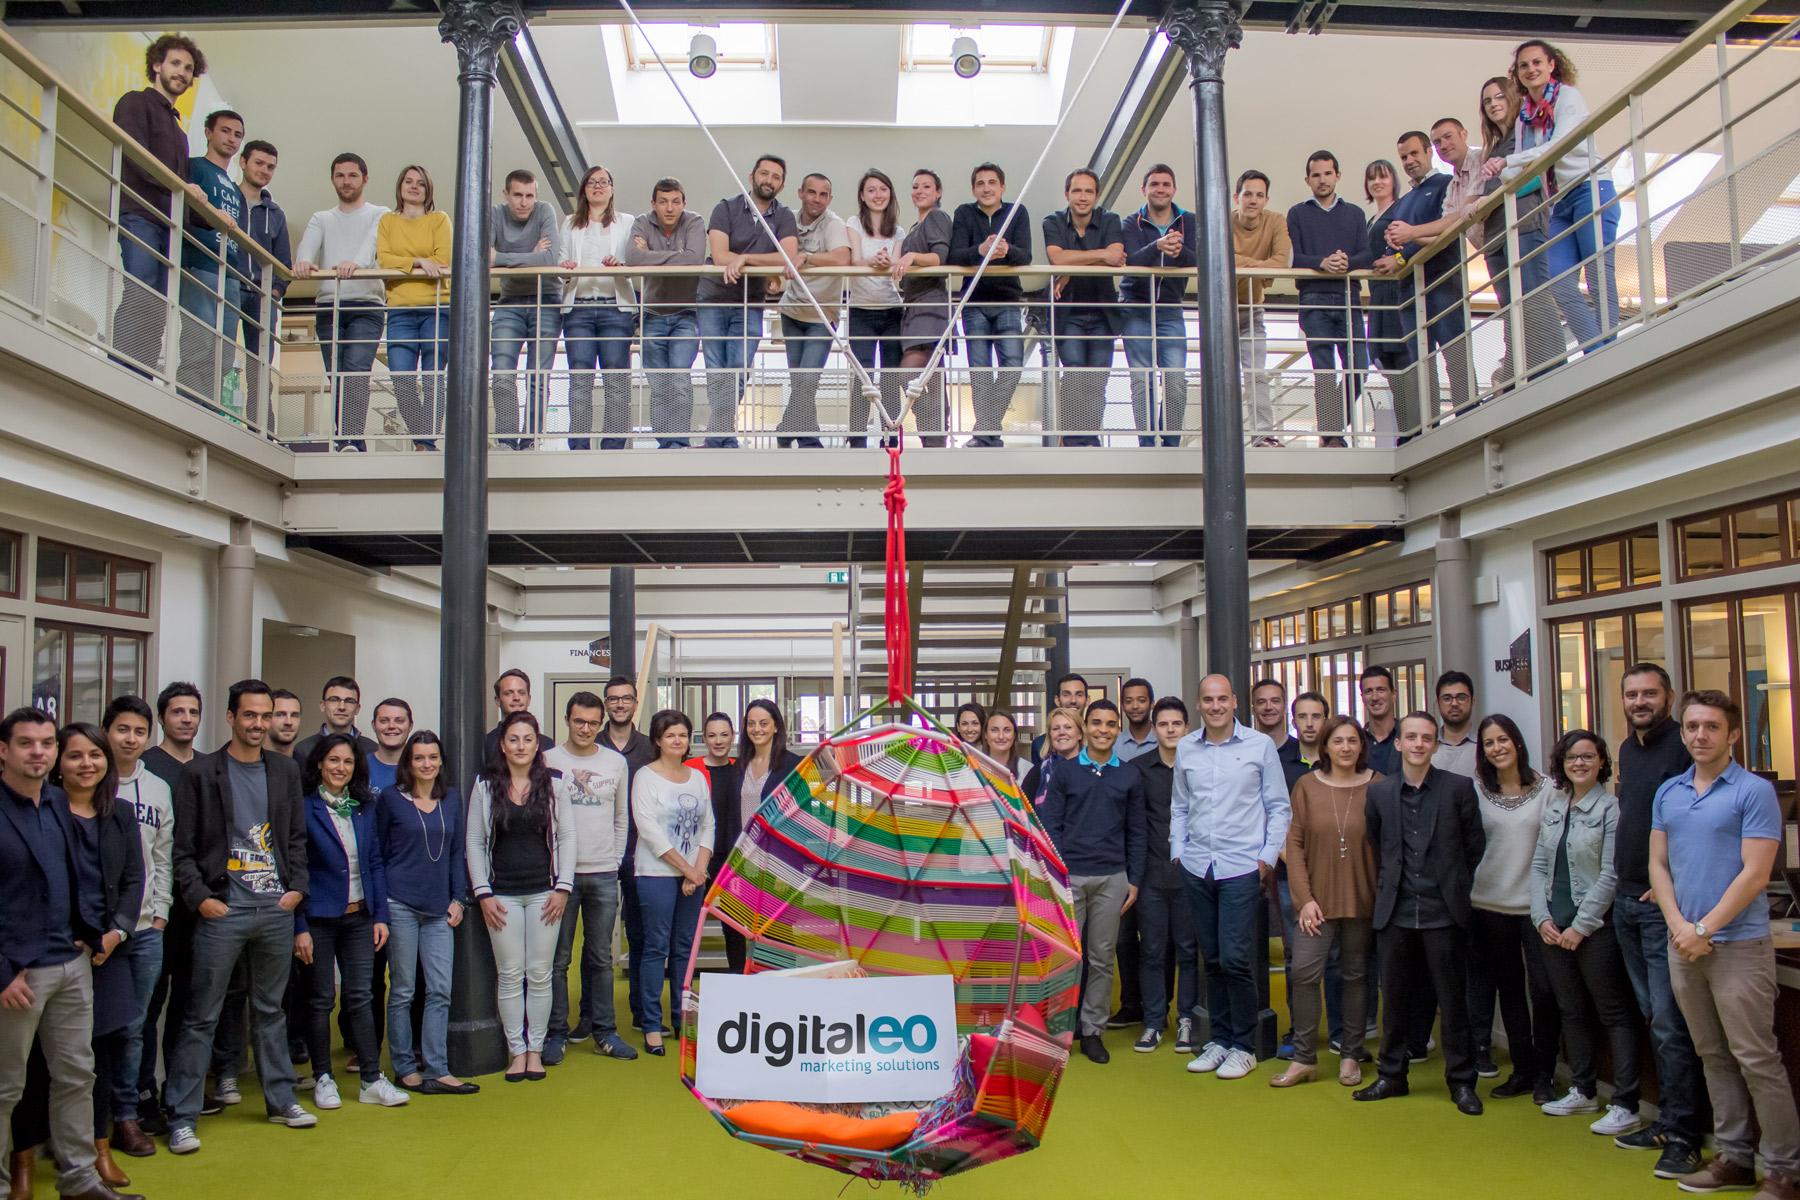 Digitaleo-Team-Photo_1.jpg